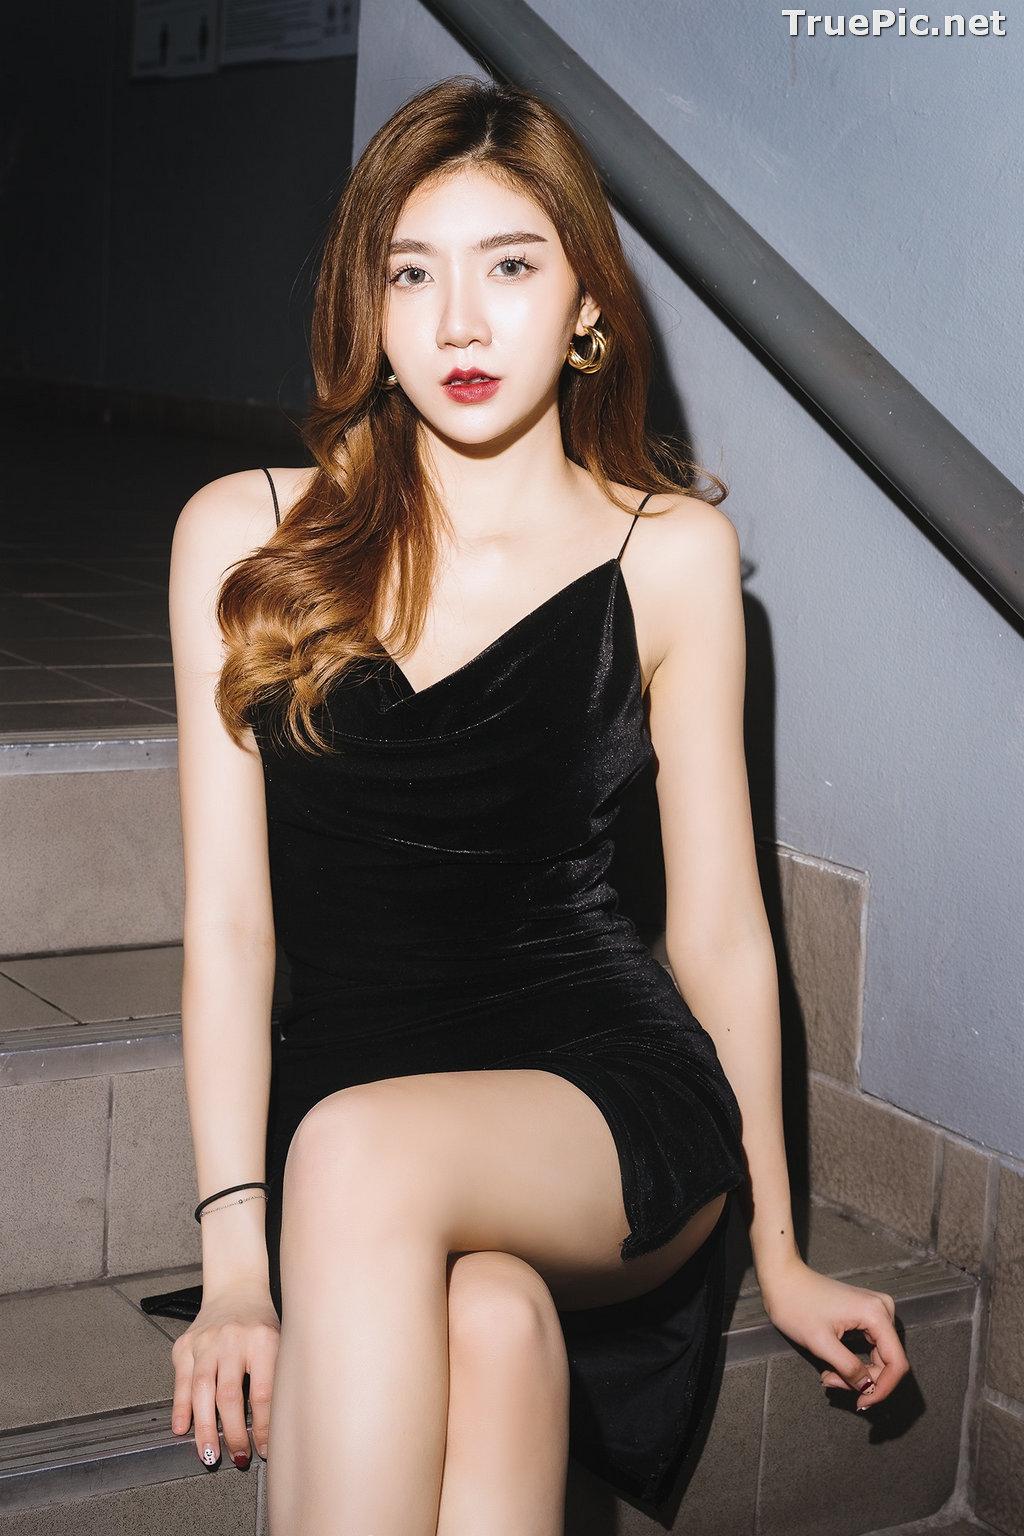 Image Thailand Model - Sasi Ngiunwan - Black For SiamNight - TruePic.net - Picture-30